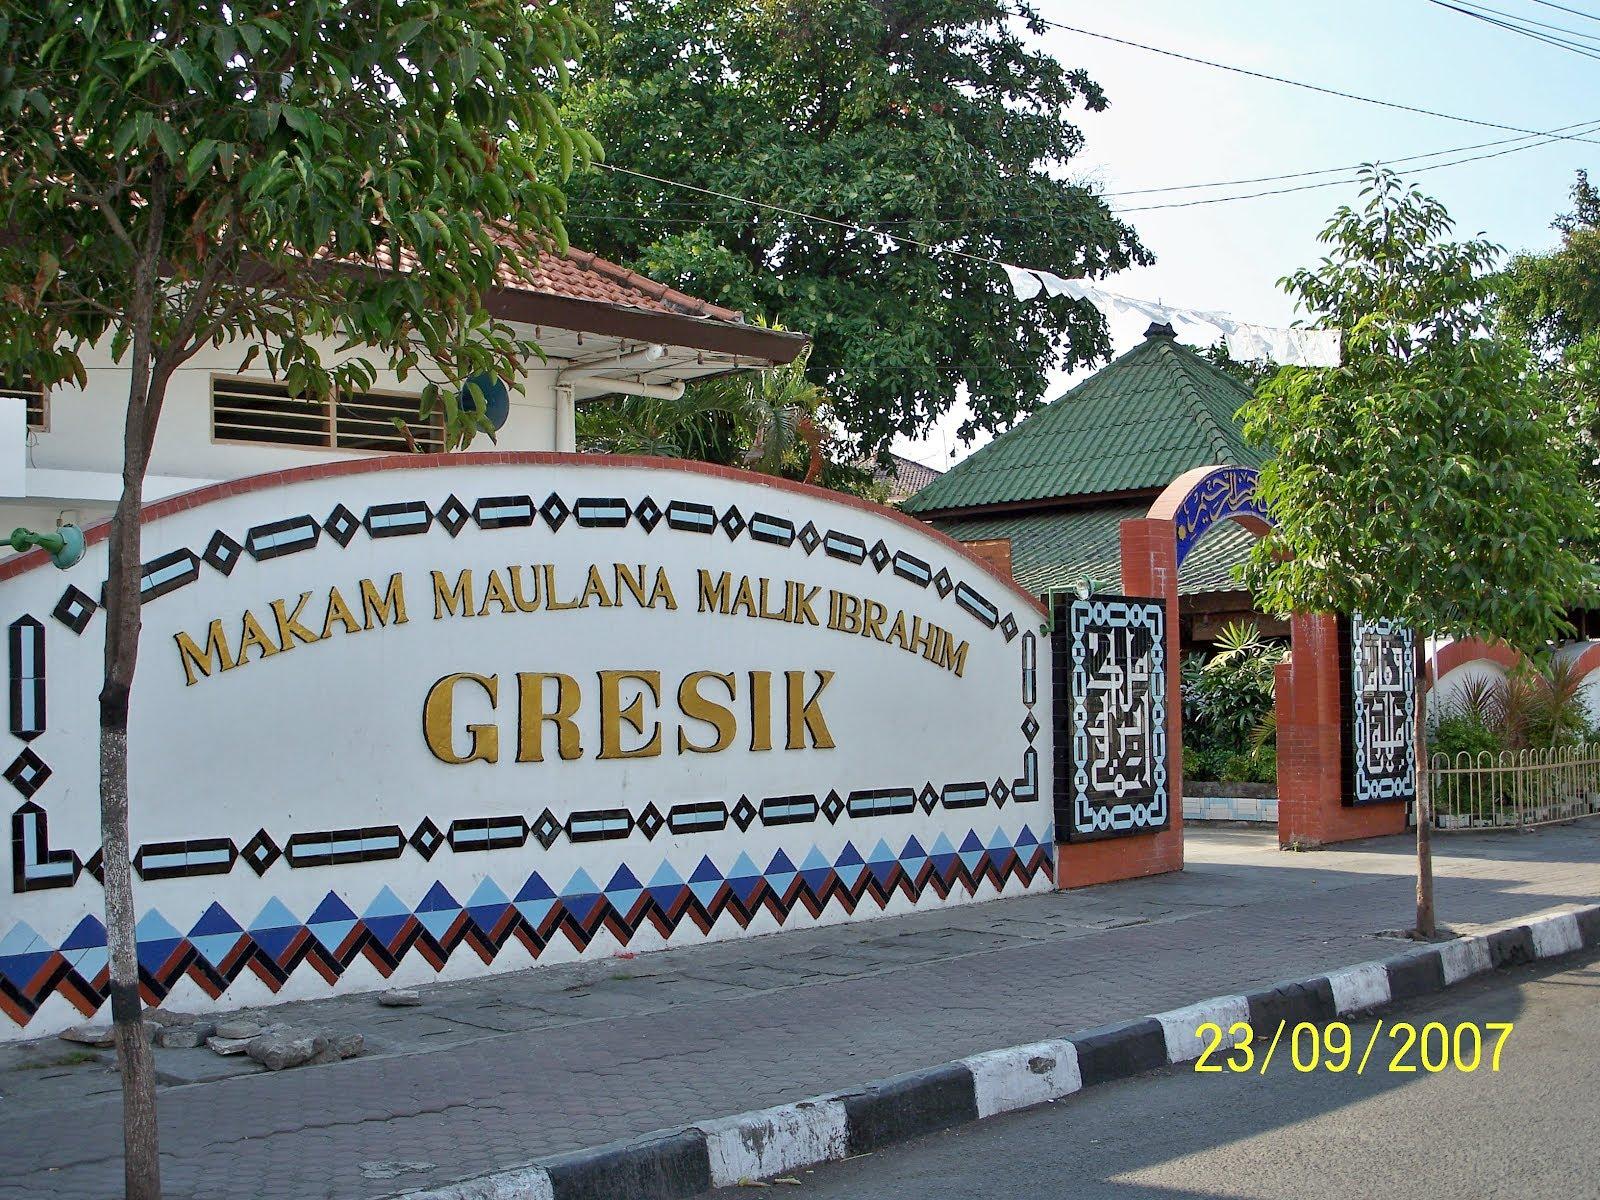 Makam Maulana Malik Ibrahim Gresik Kota Wisata Religi Mas Laros